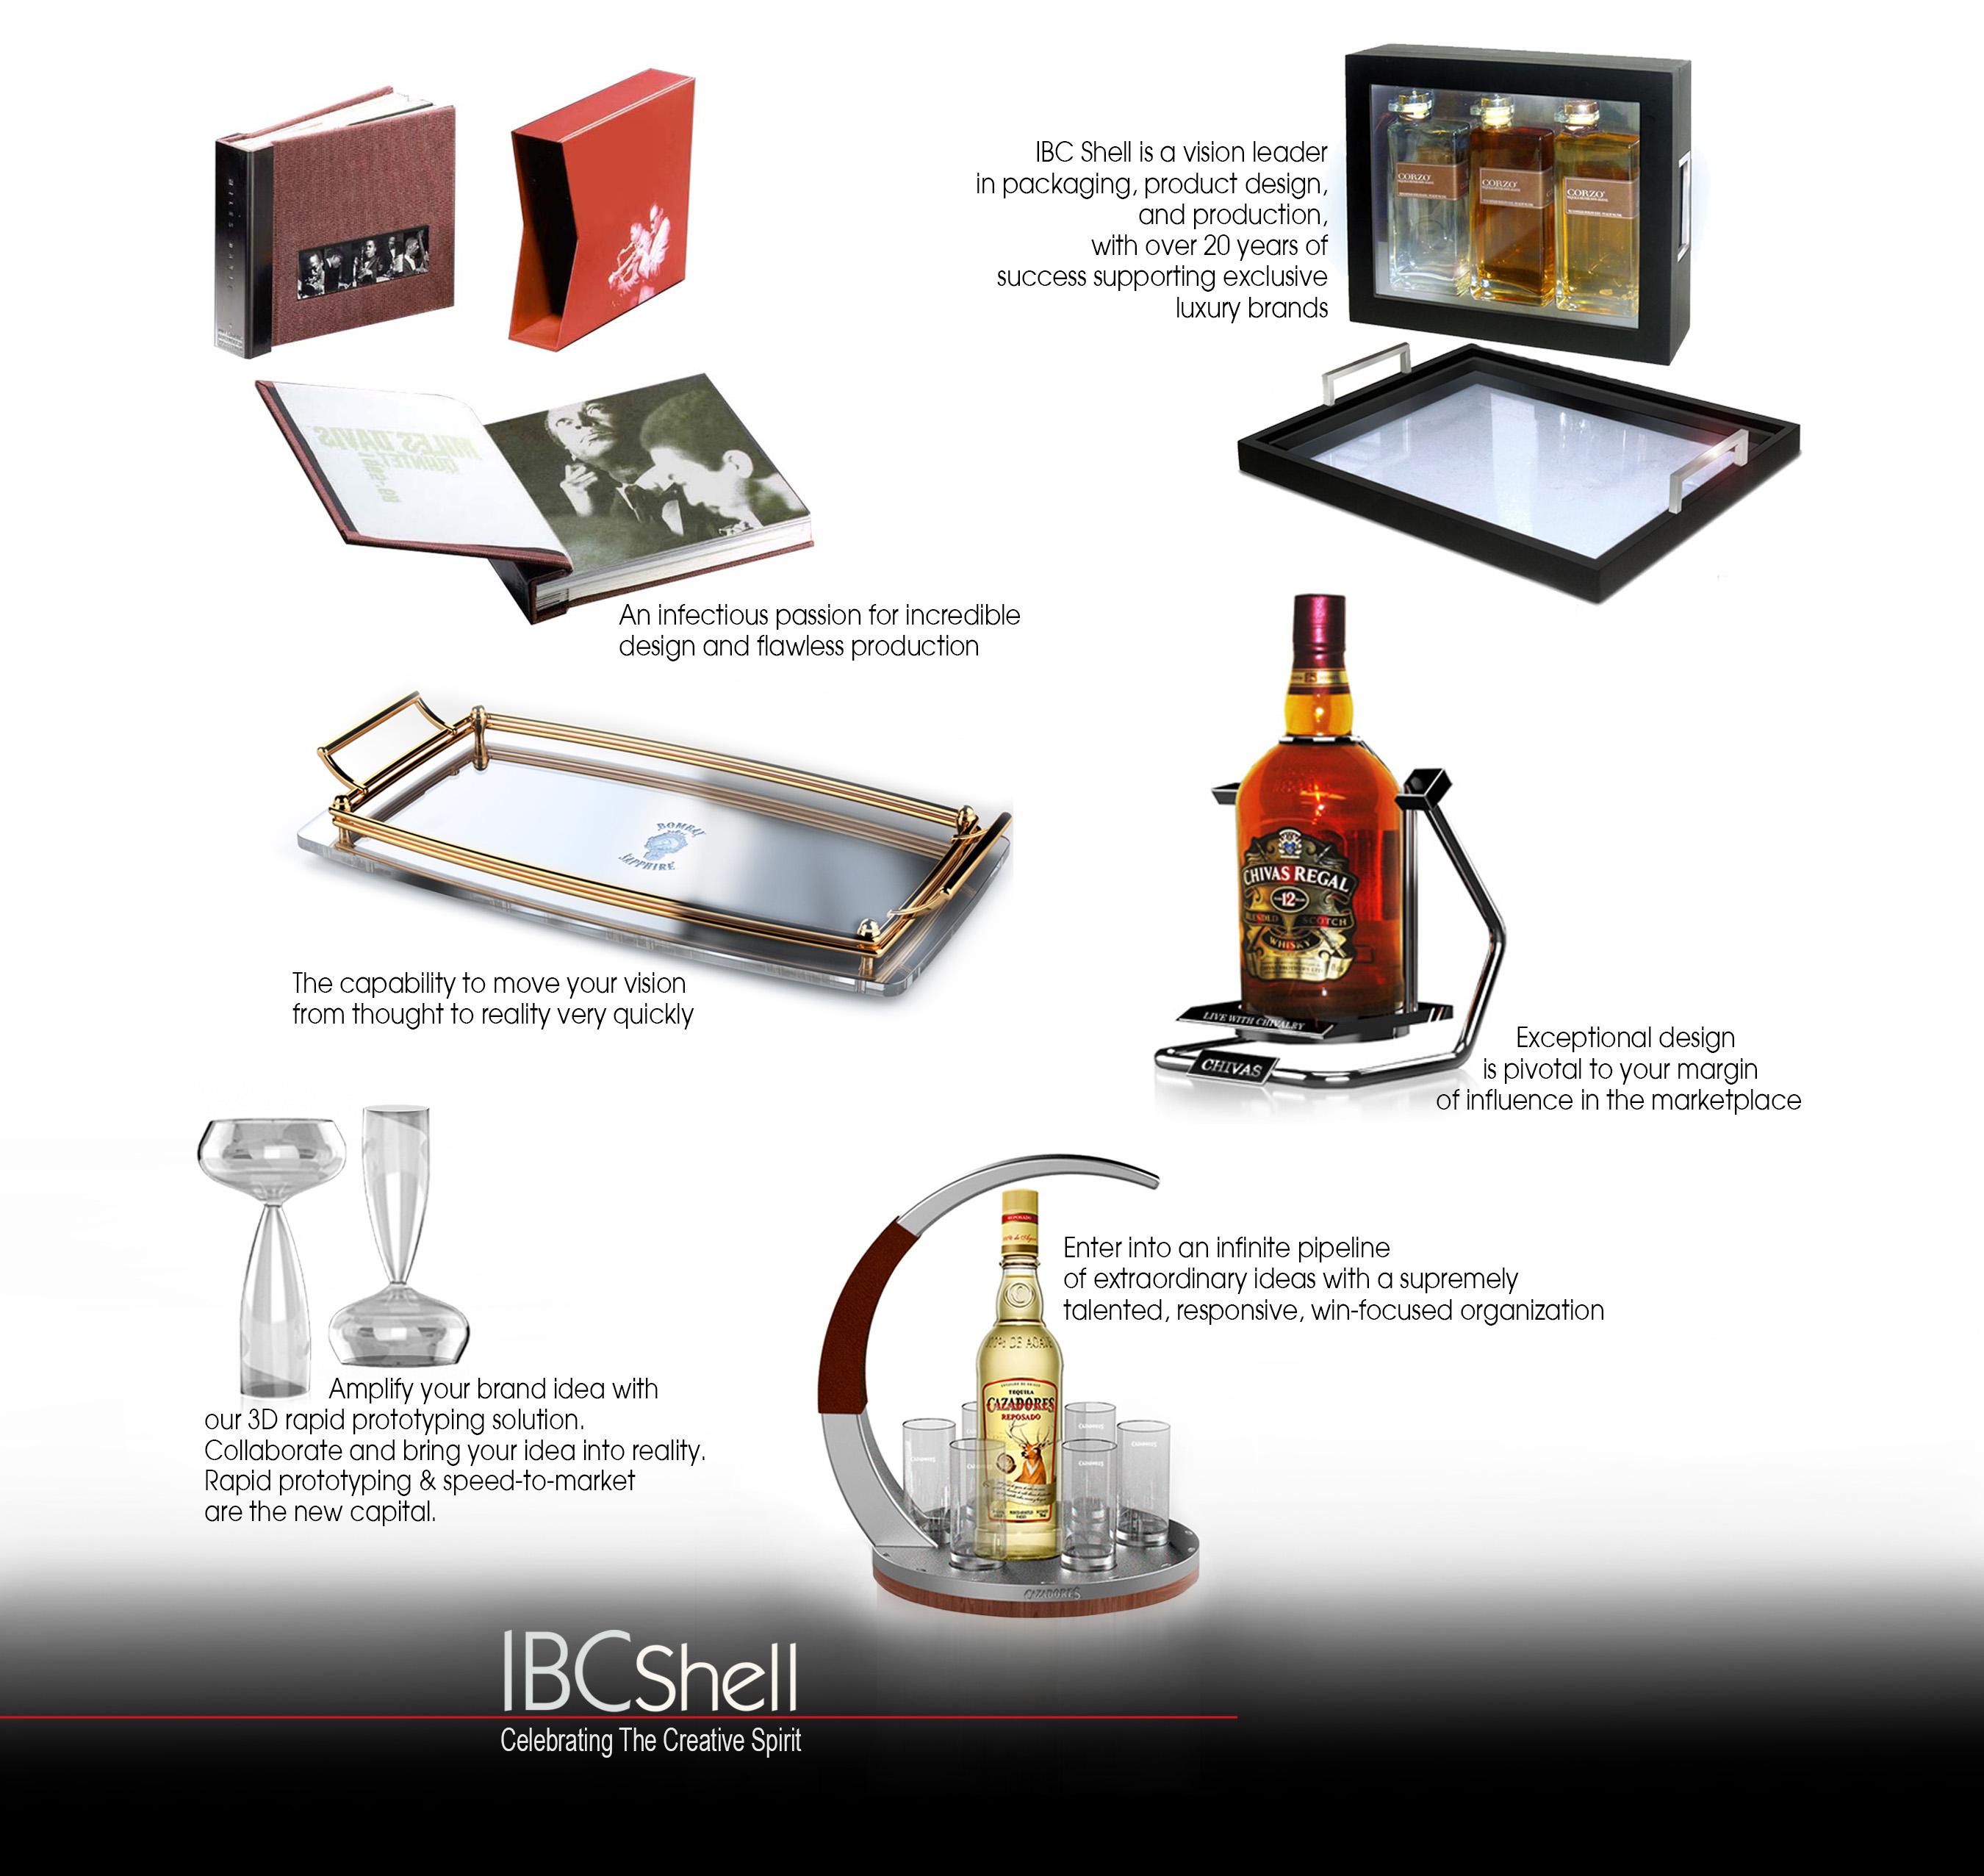 award winning product design